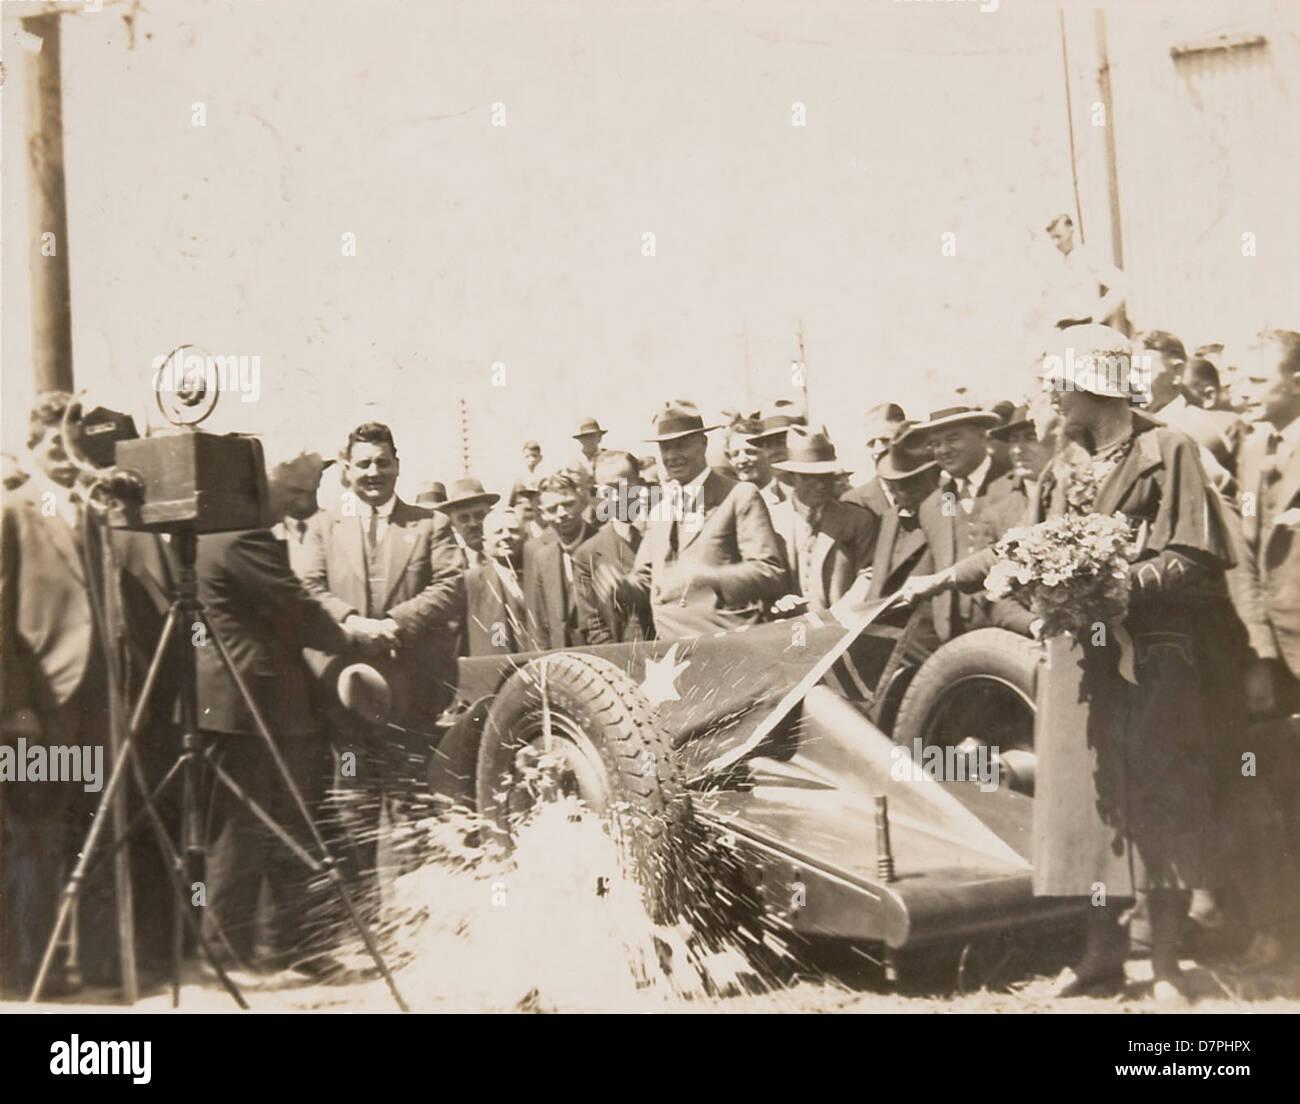 Launch of car 'F.H. Stewart Enterprise', 1926 - 1936 - Stock Image